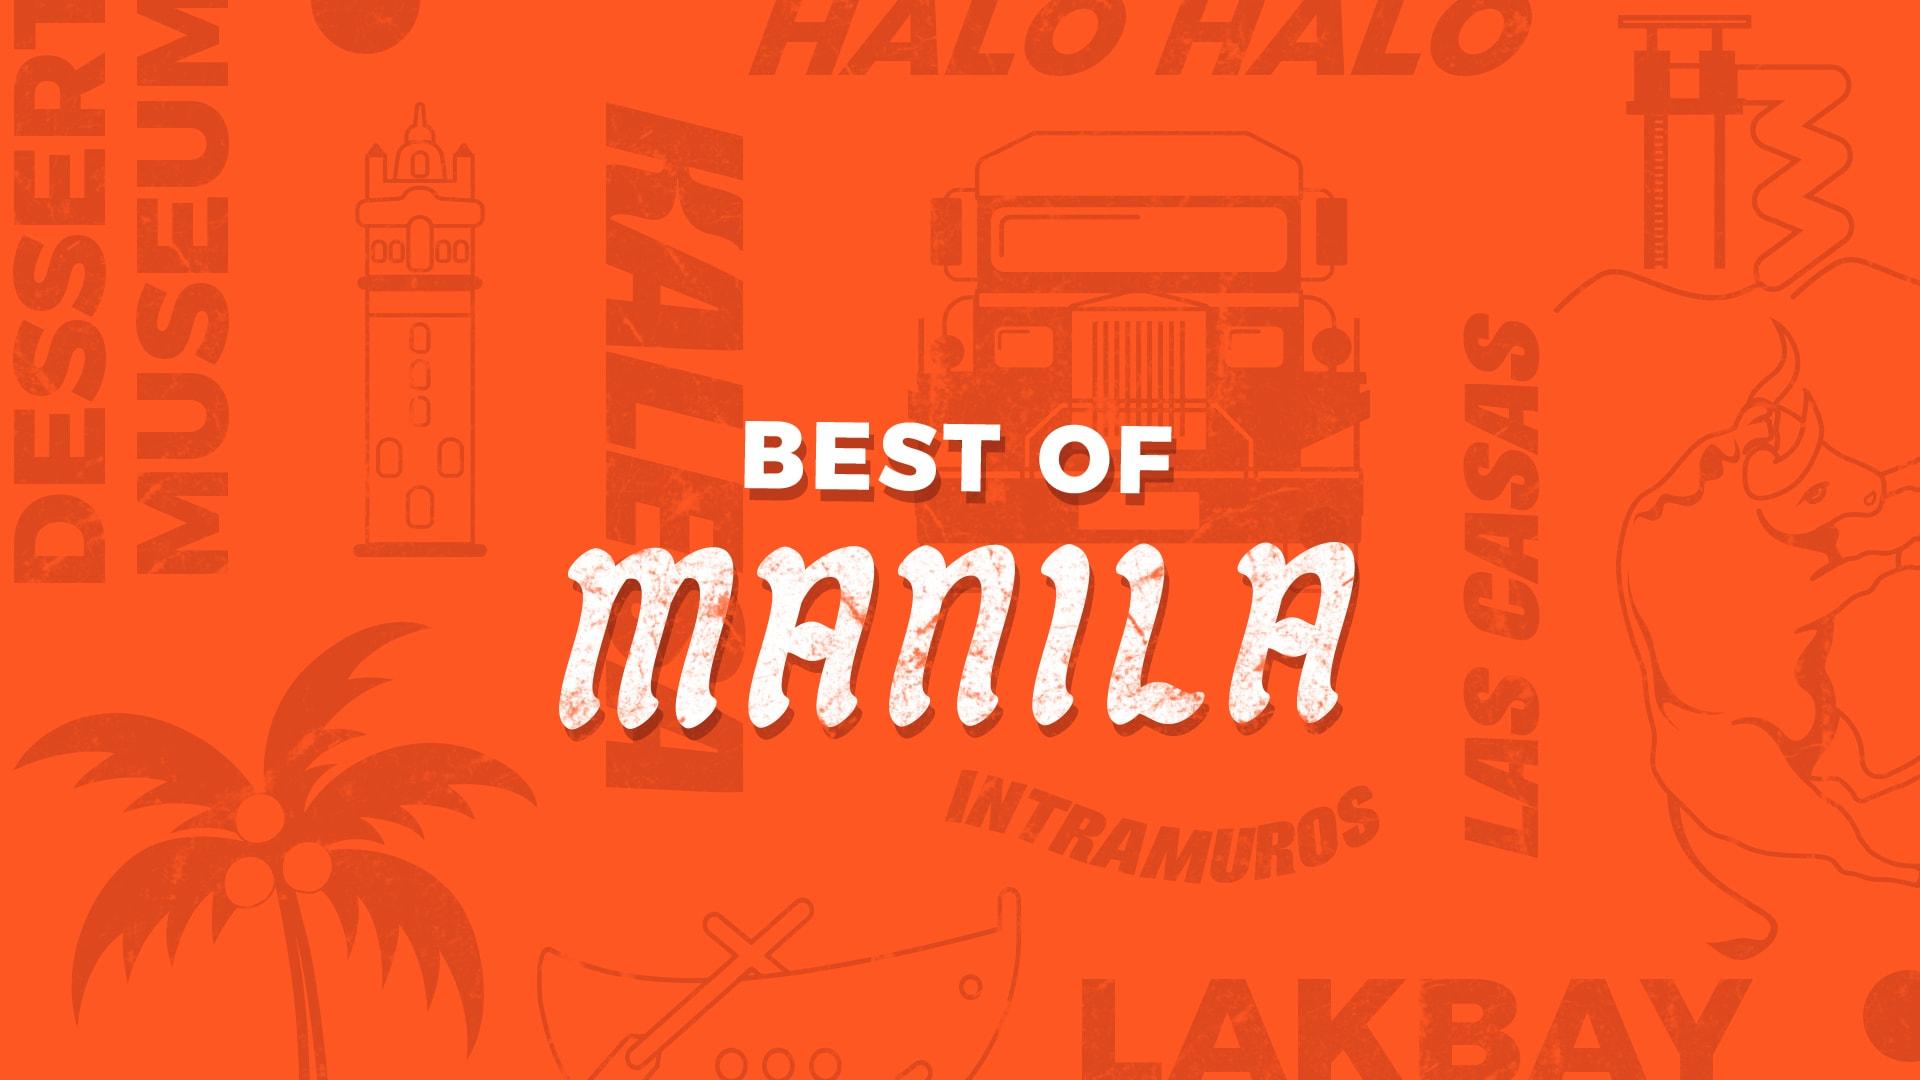 best of manila